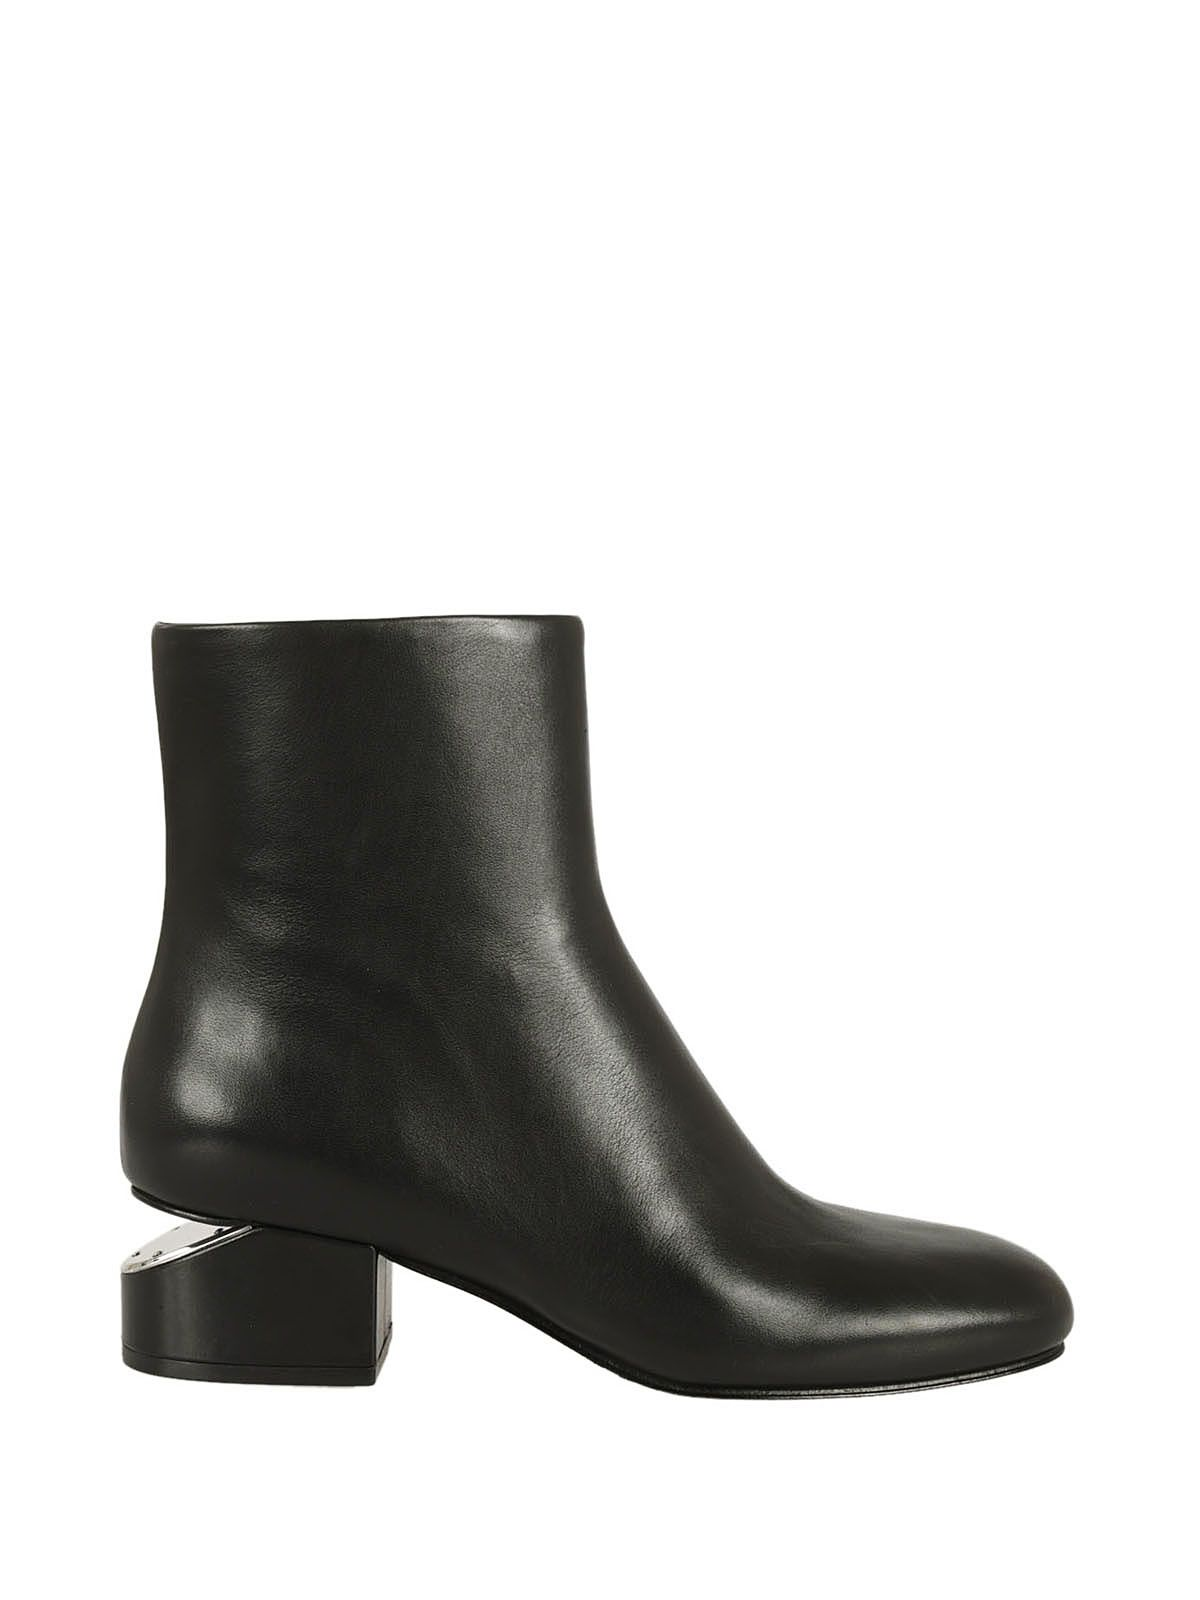 Alexander Wang Kelly Boots